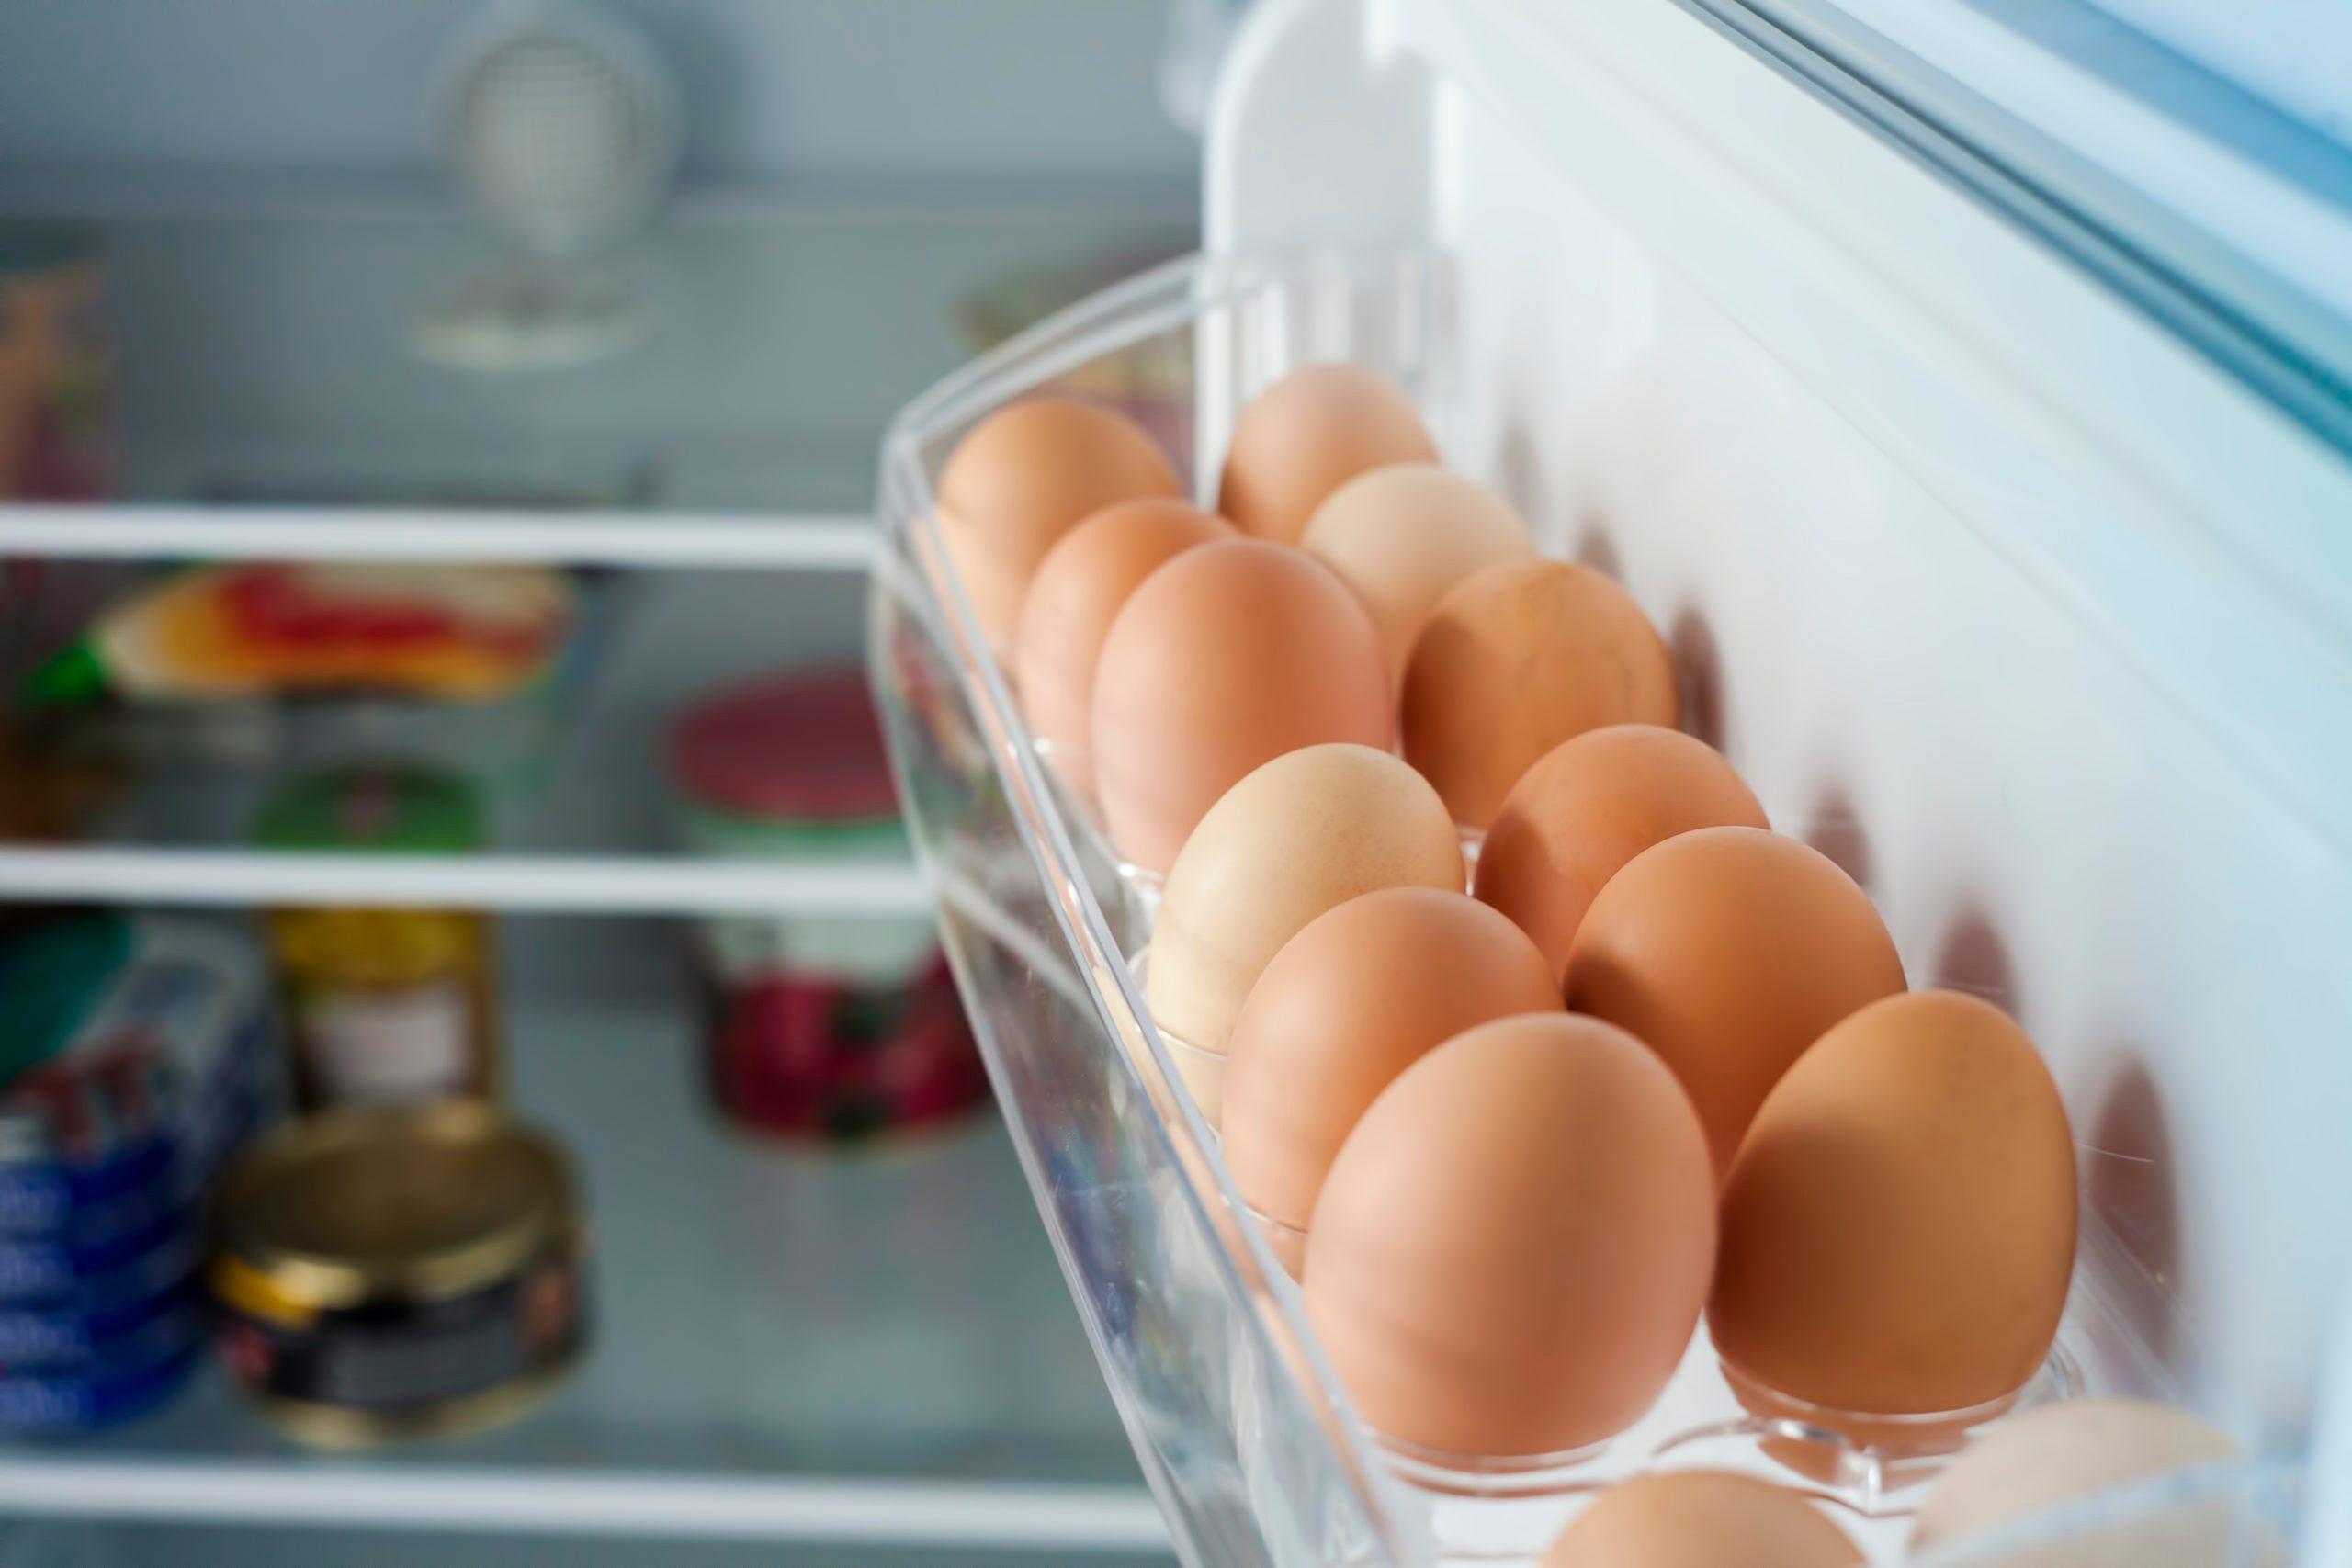 healthy bio eggs in the fridge